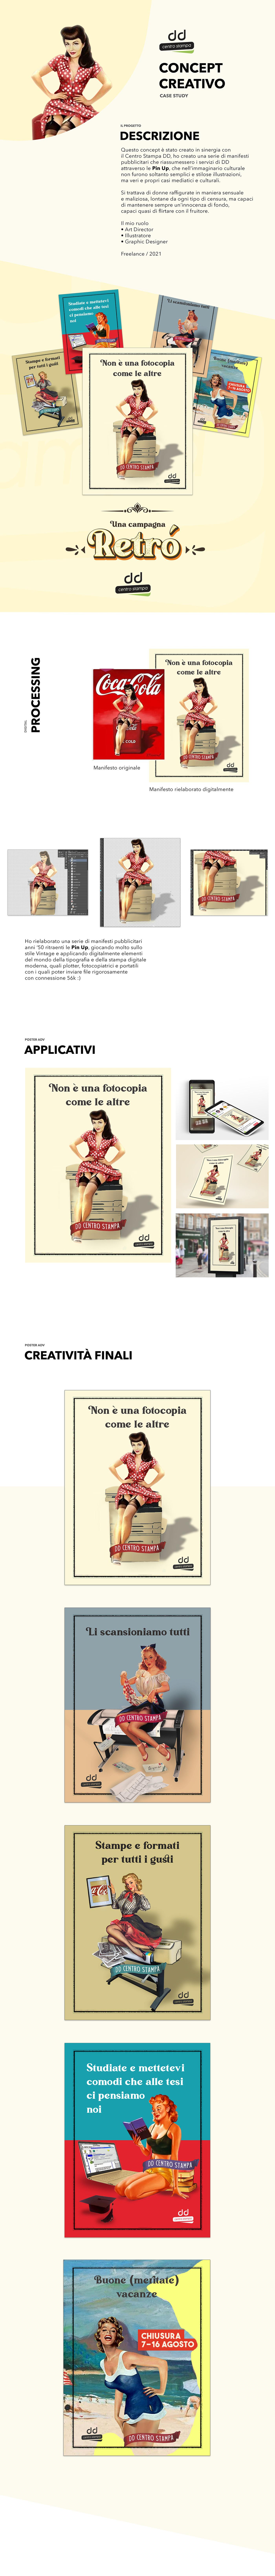 Creativity graphic design  ILLUSTRATION  pin up vintage